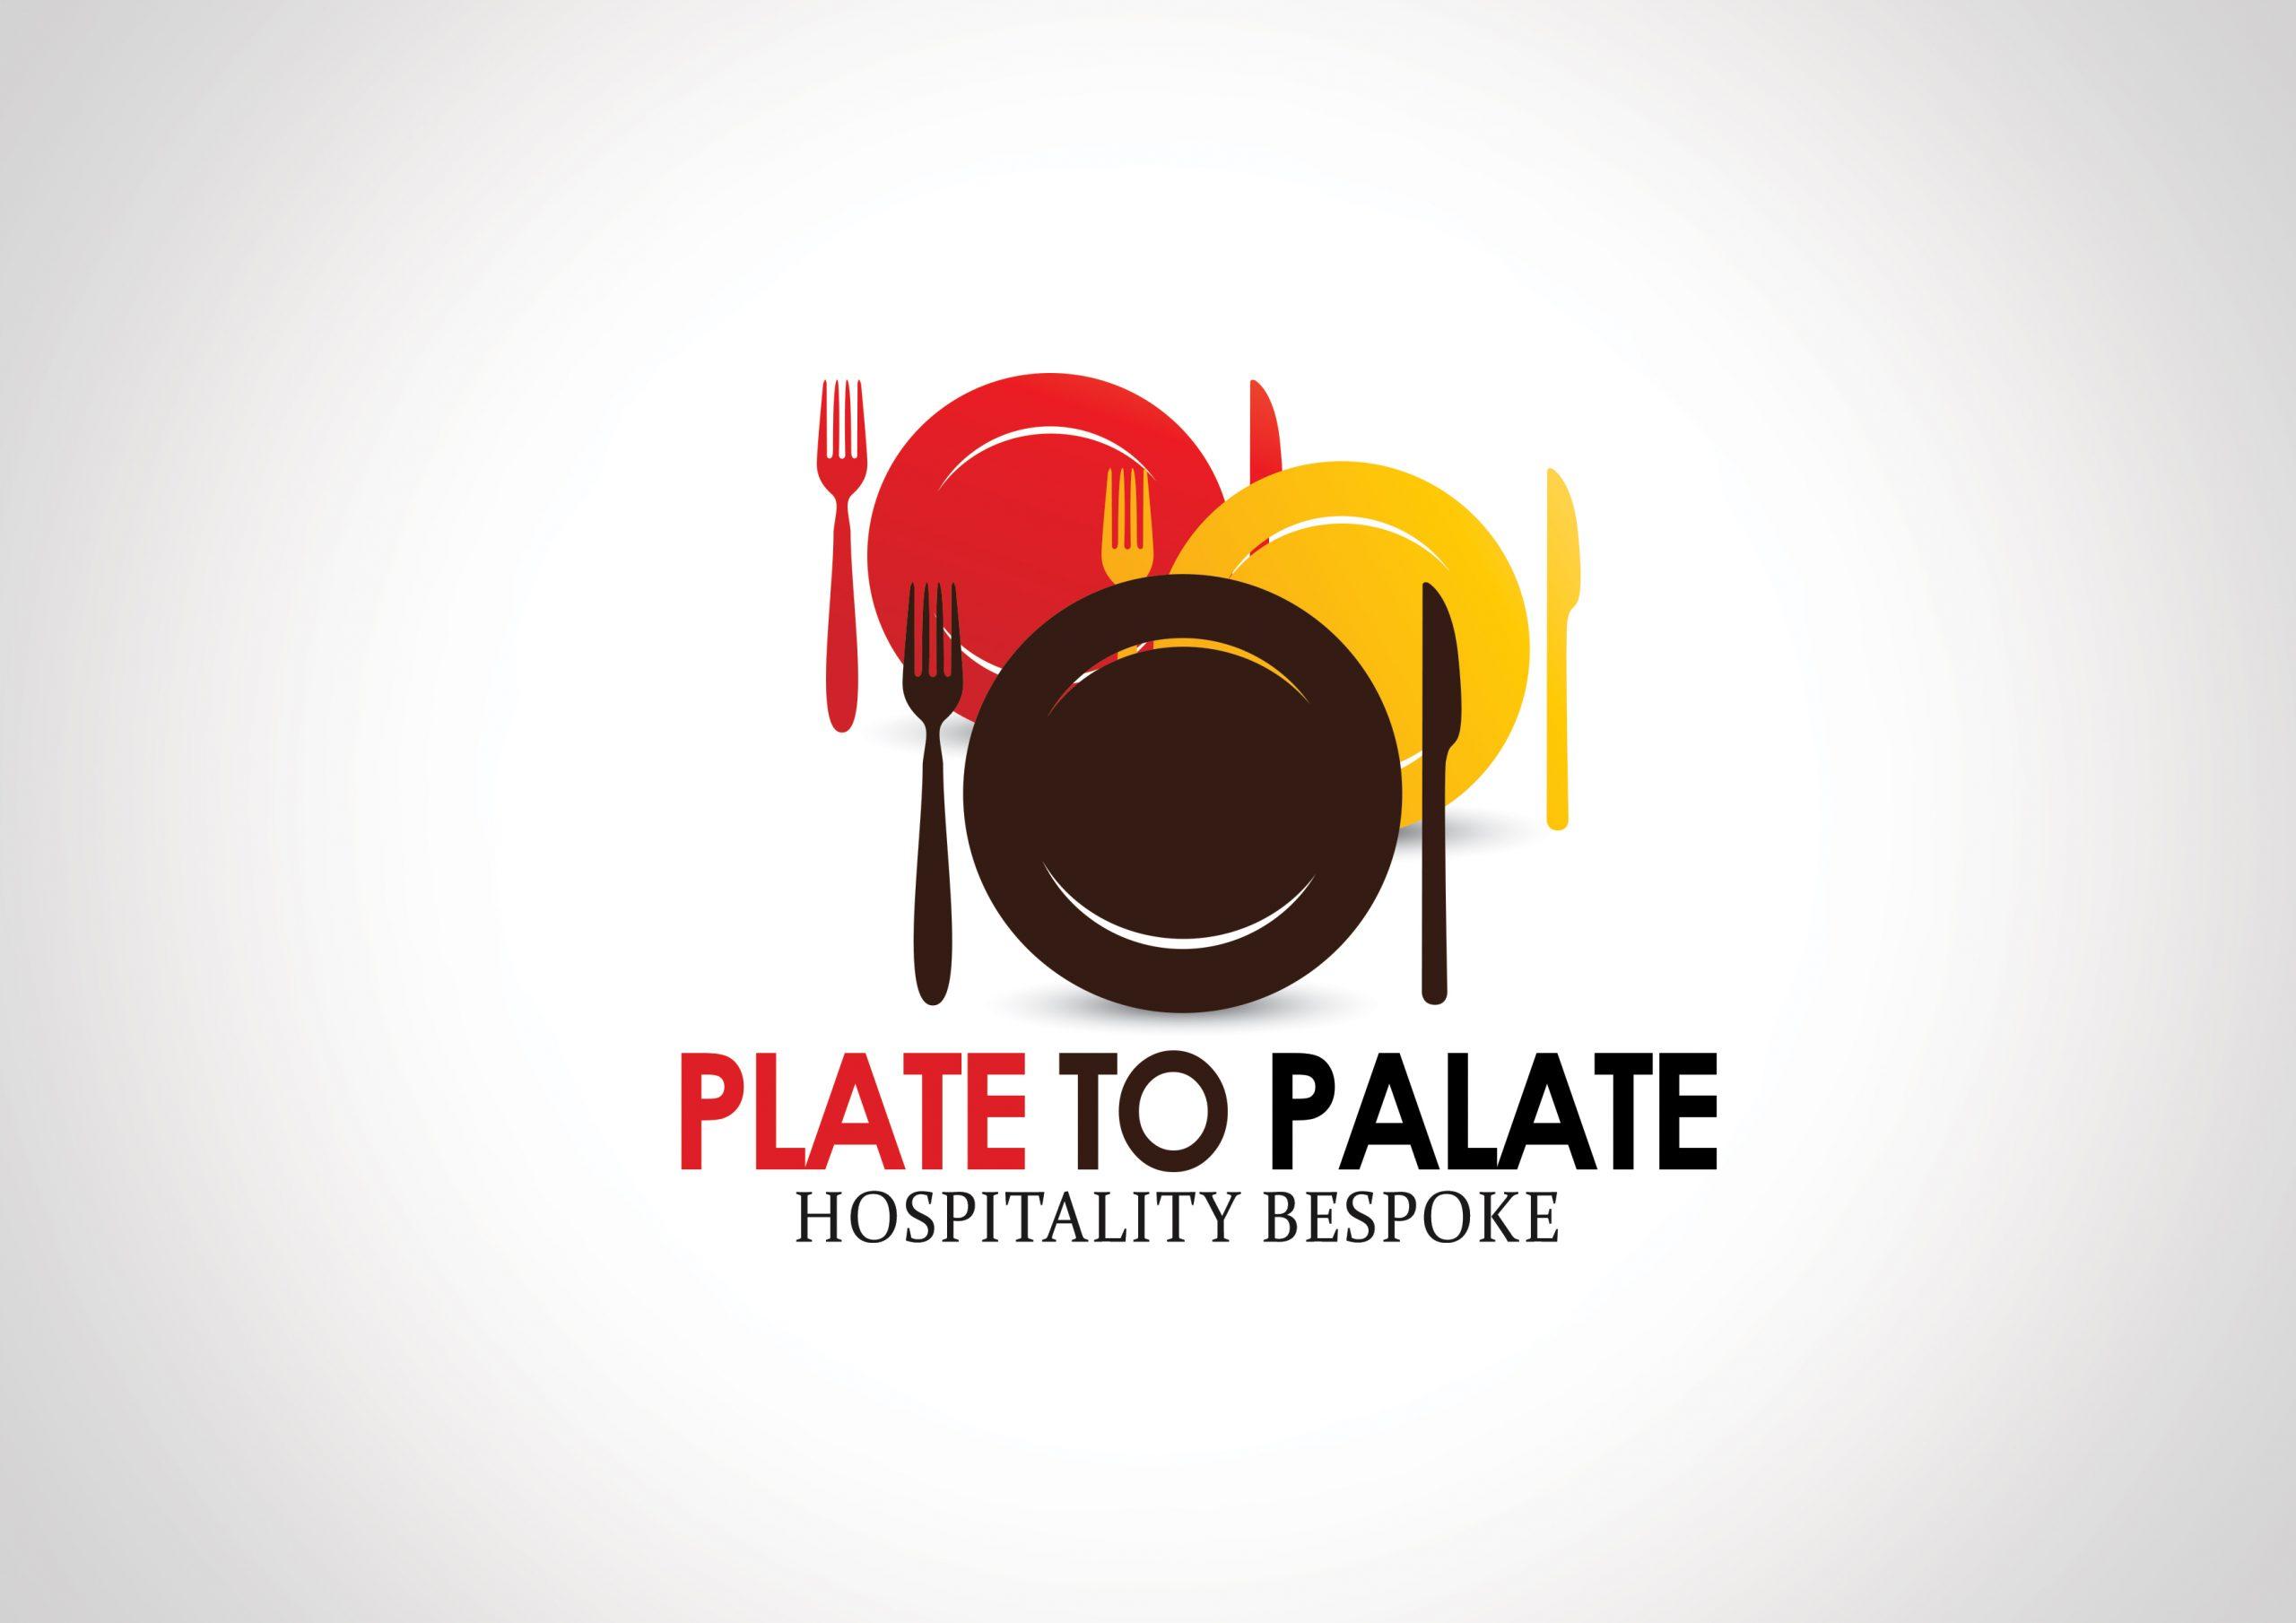 Plate to Palate